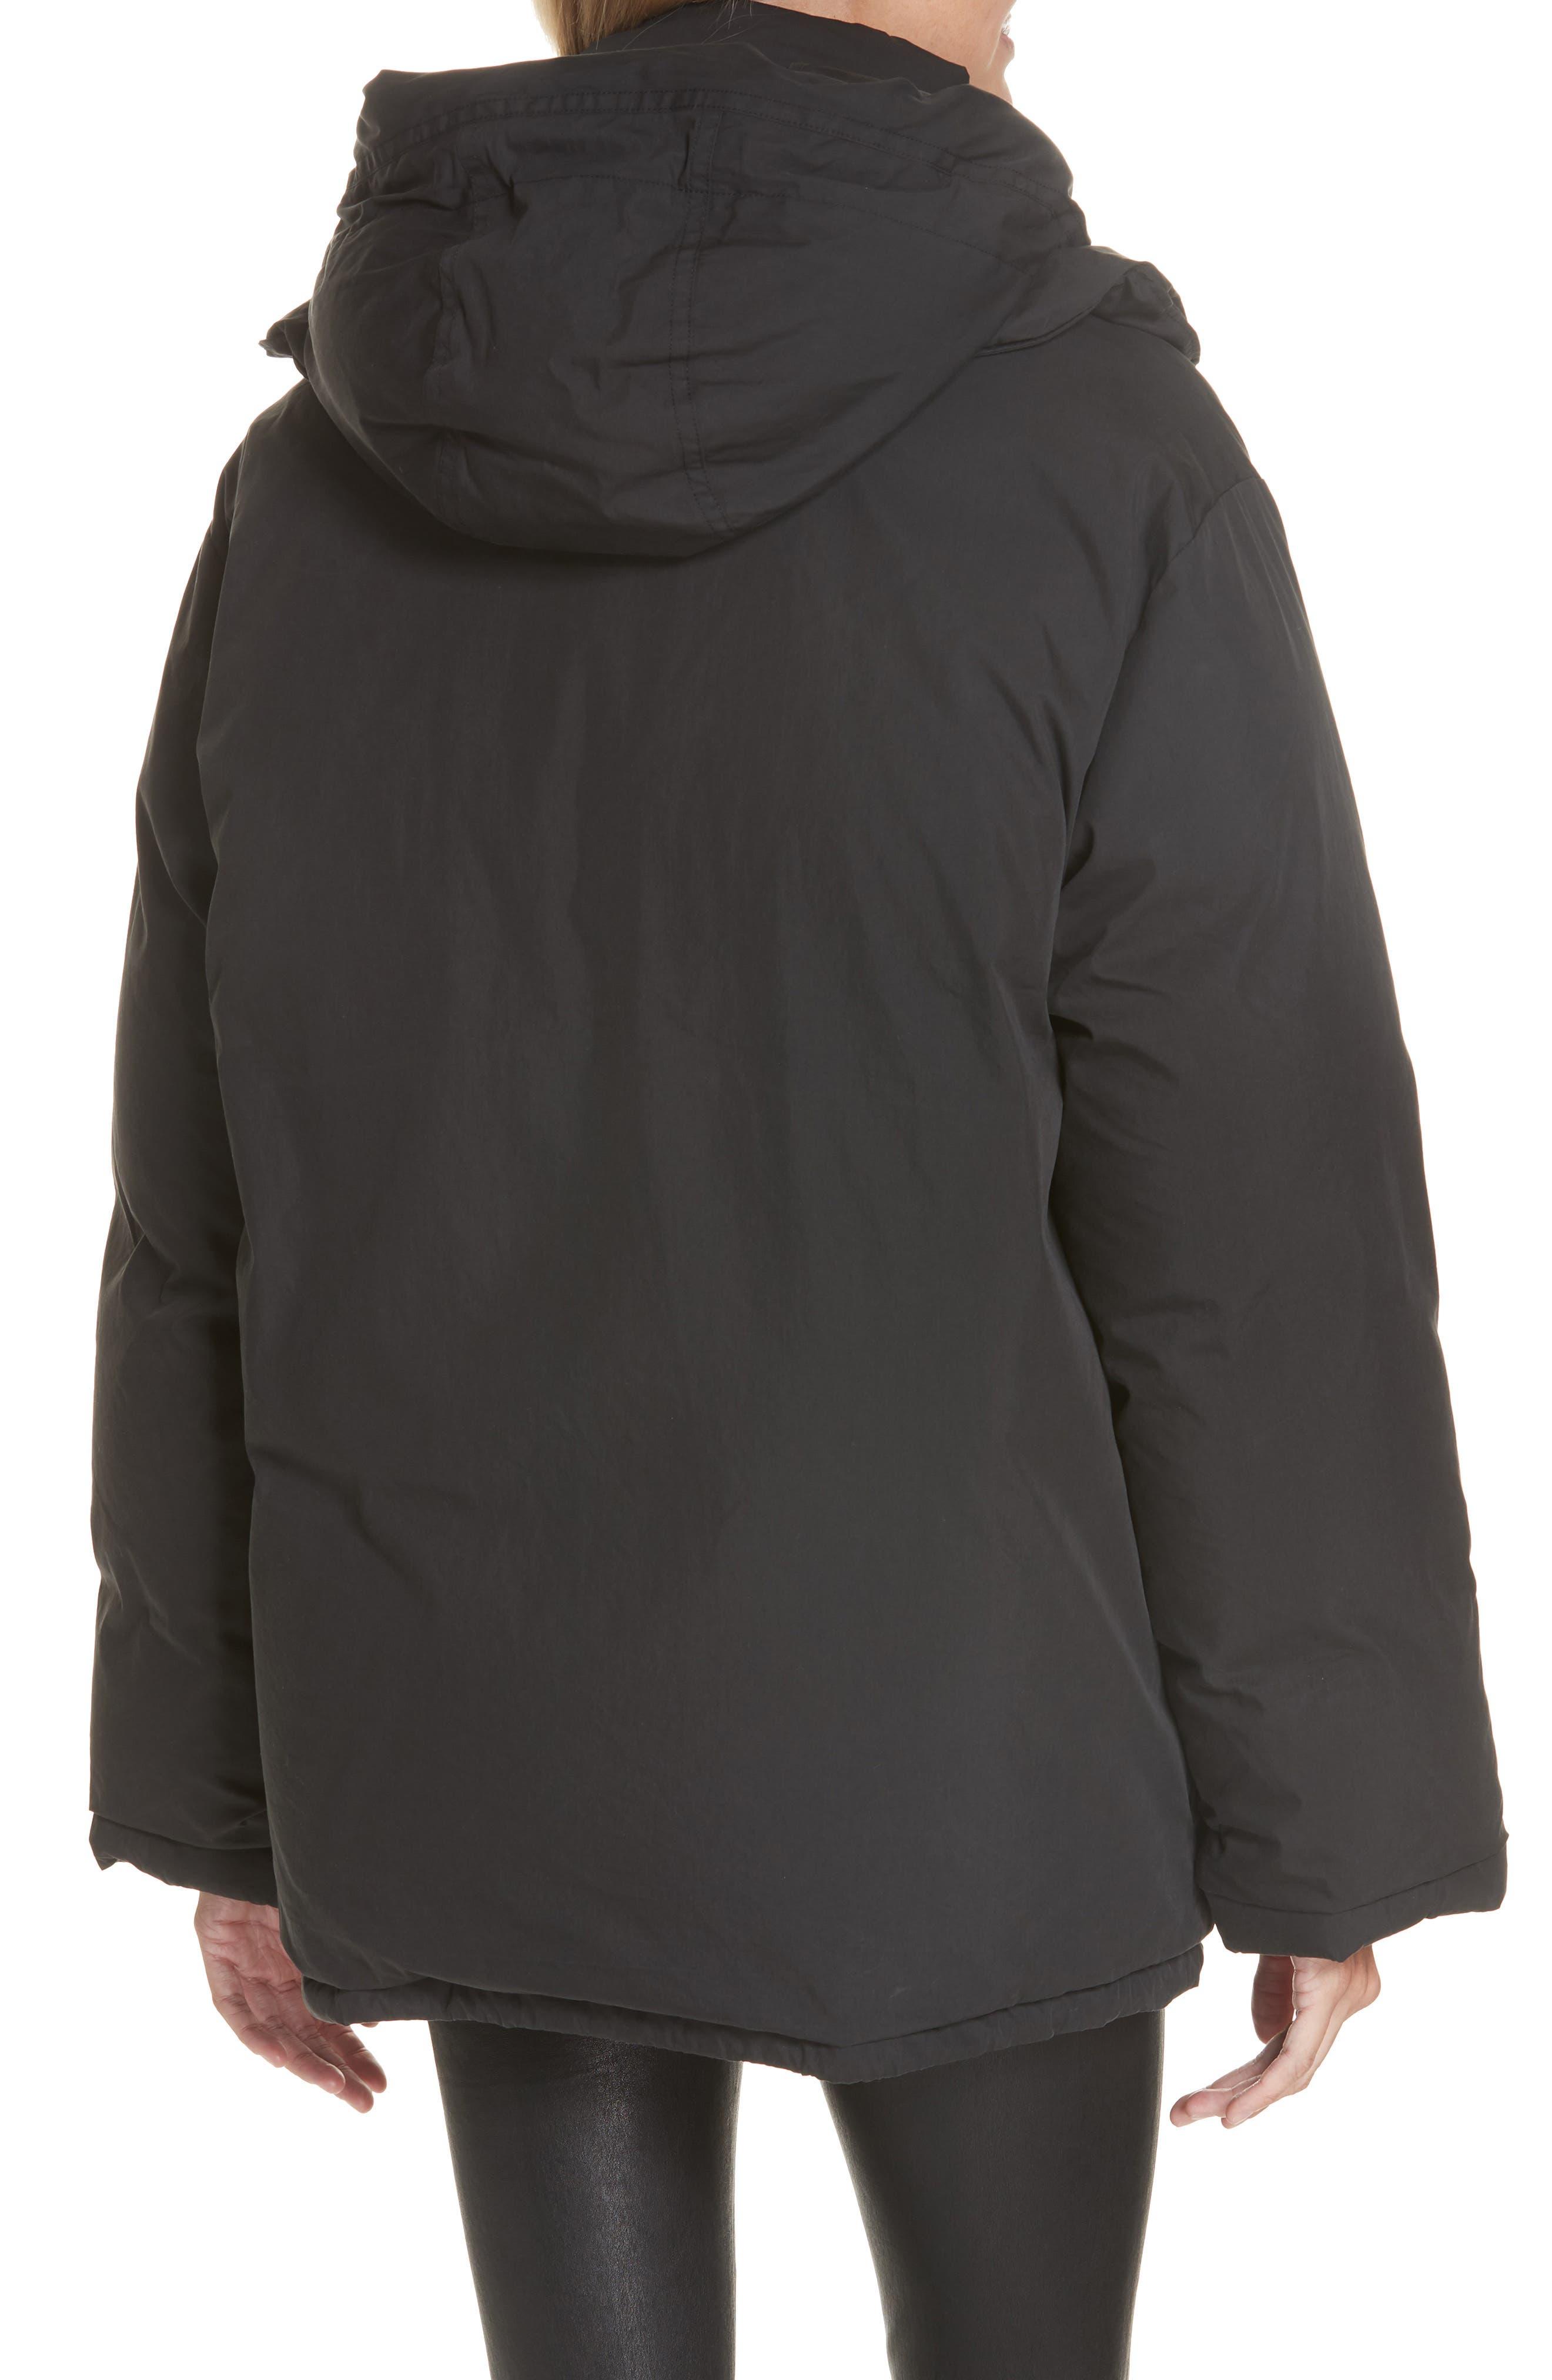 Removable Hood Puffer Jacket,                             Alternate thumbnail 3, color,                             BLACK